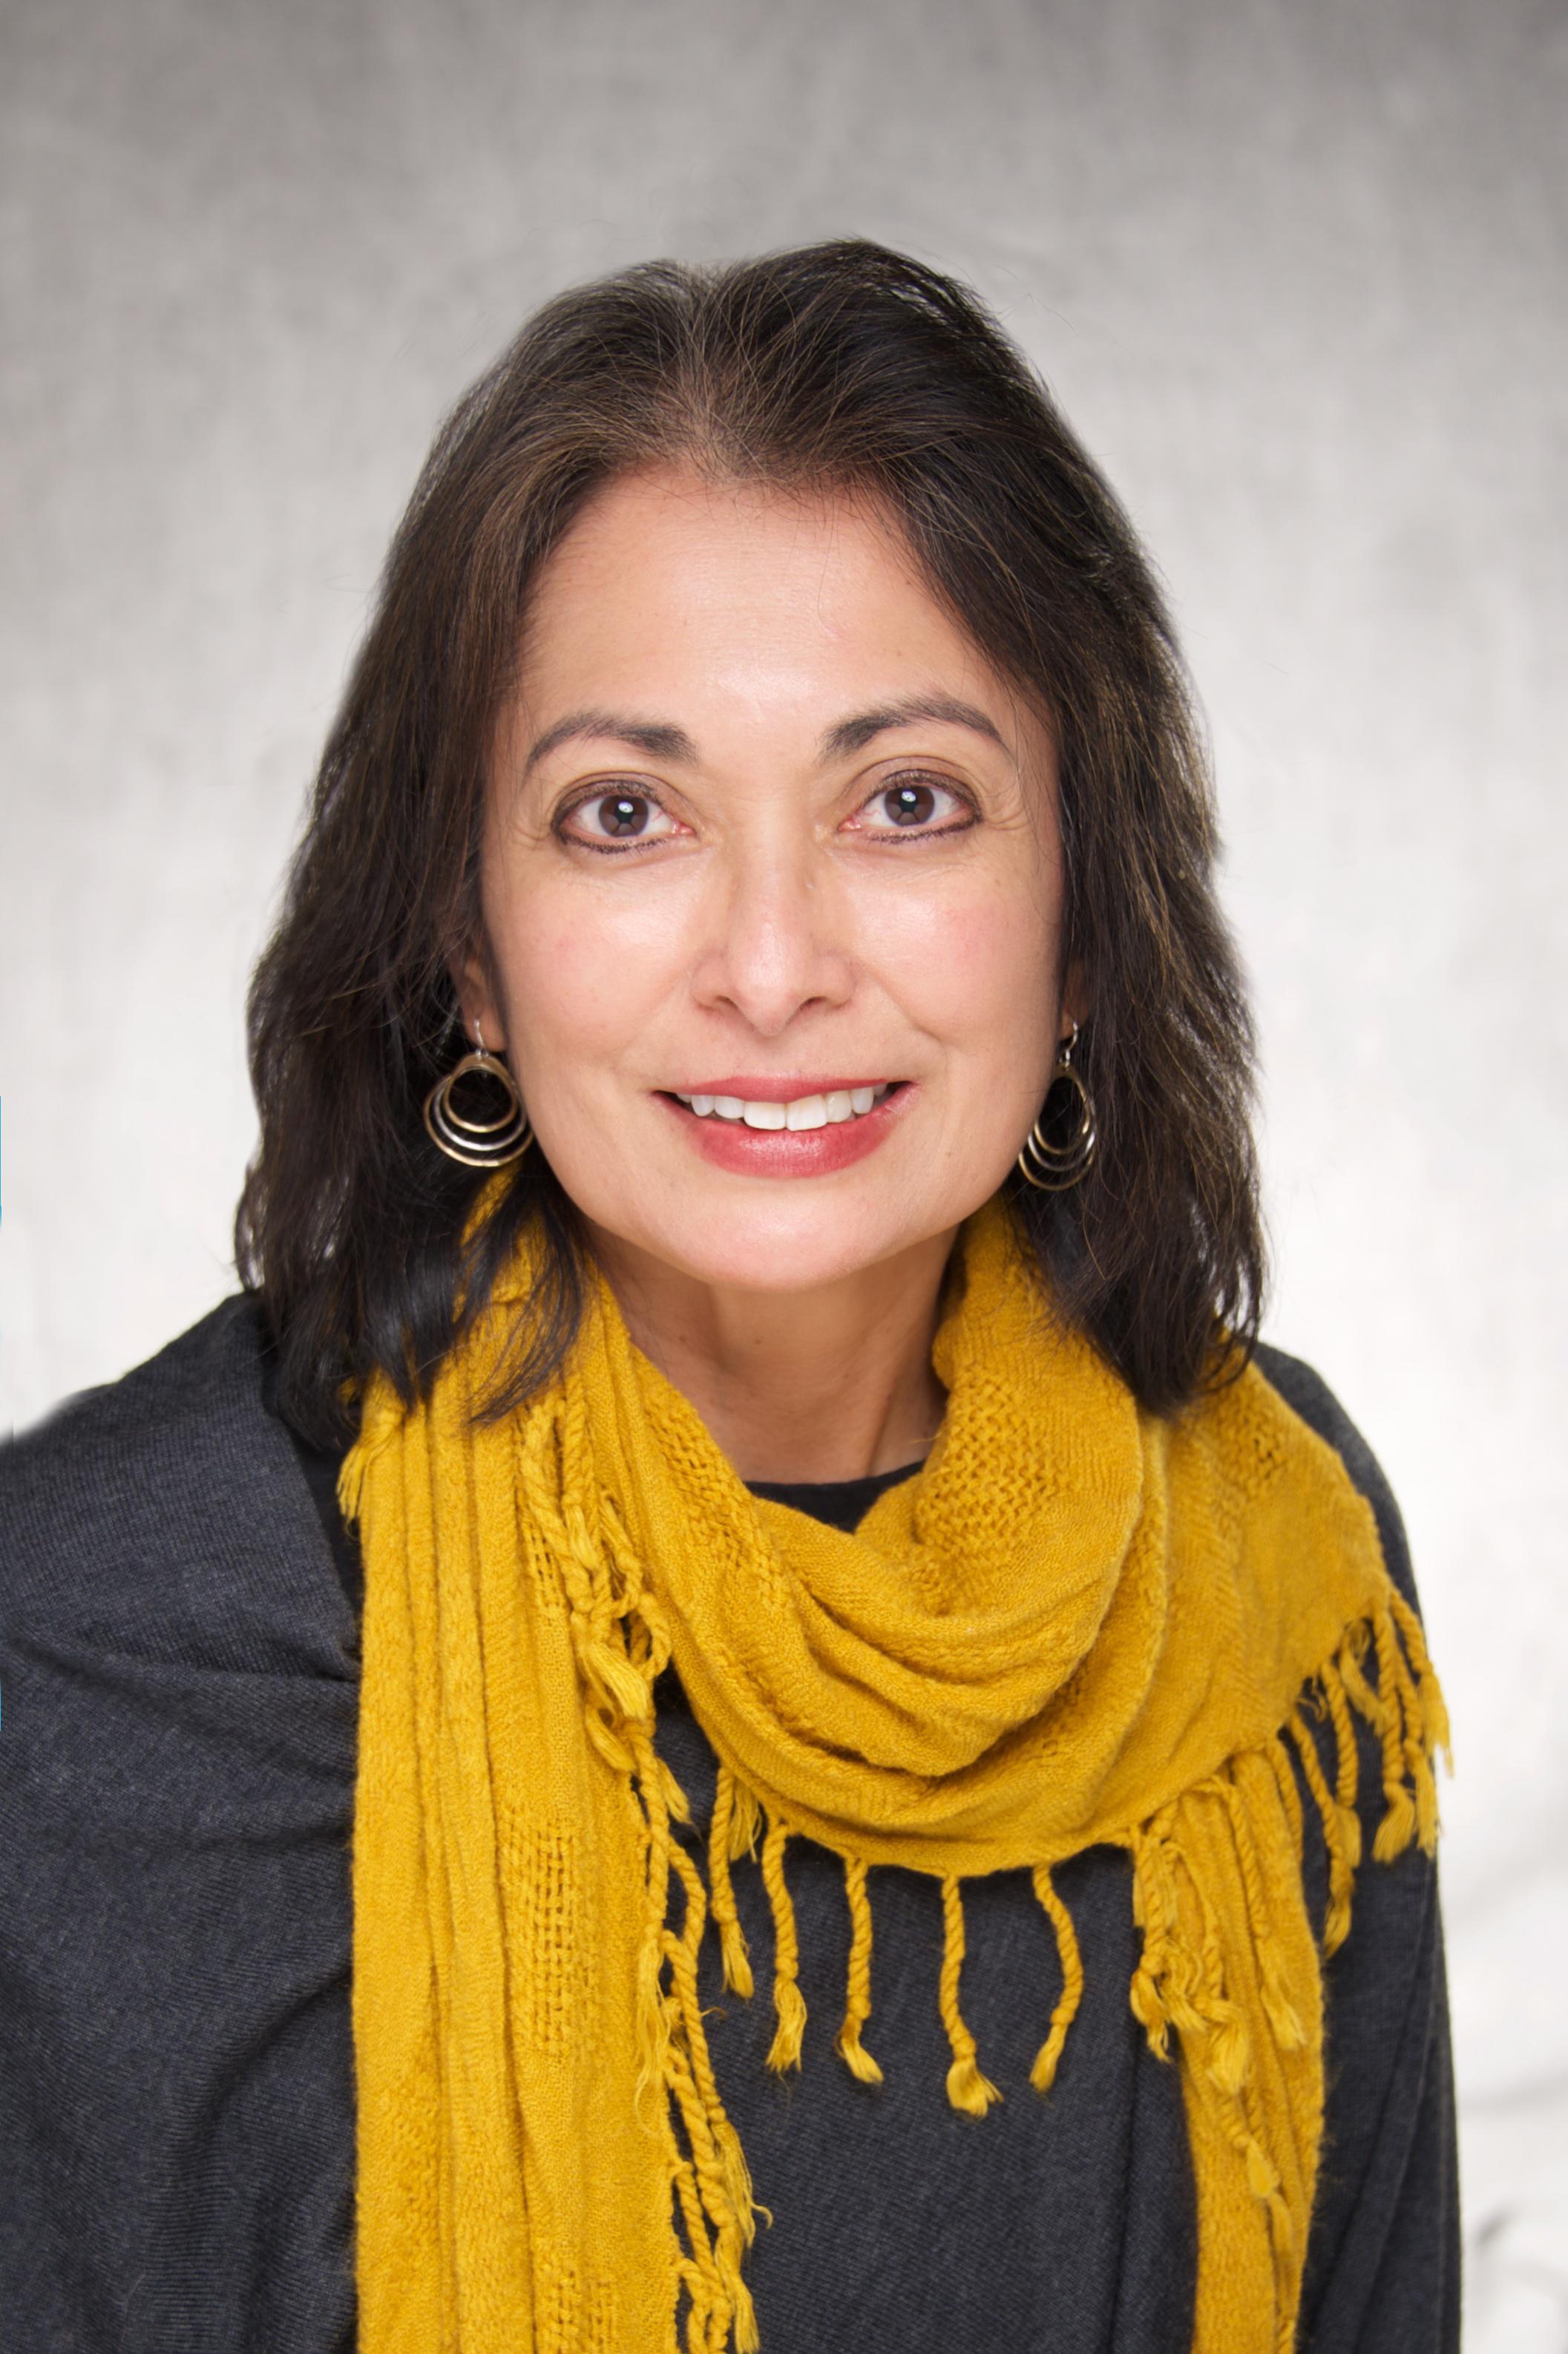 Image of Cynthia Hernandez